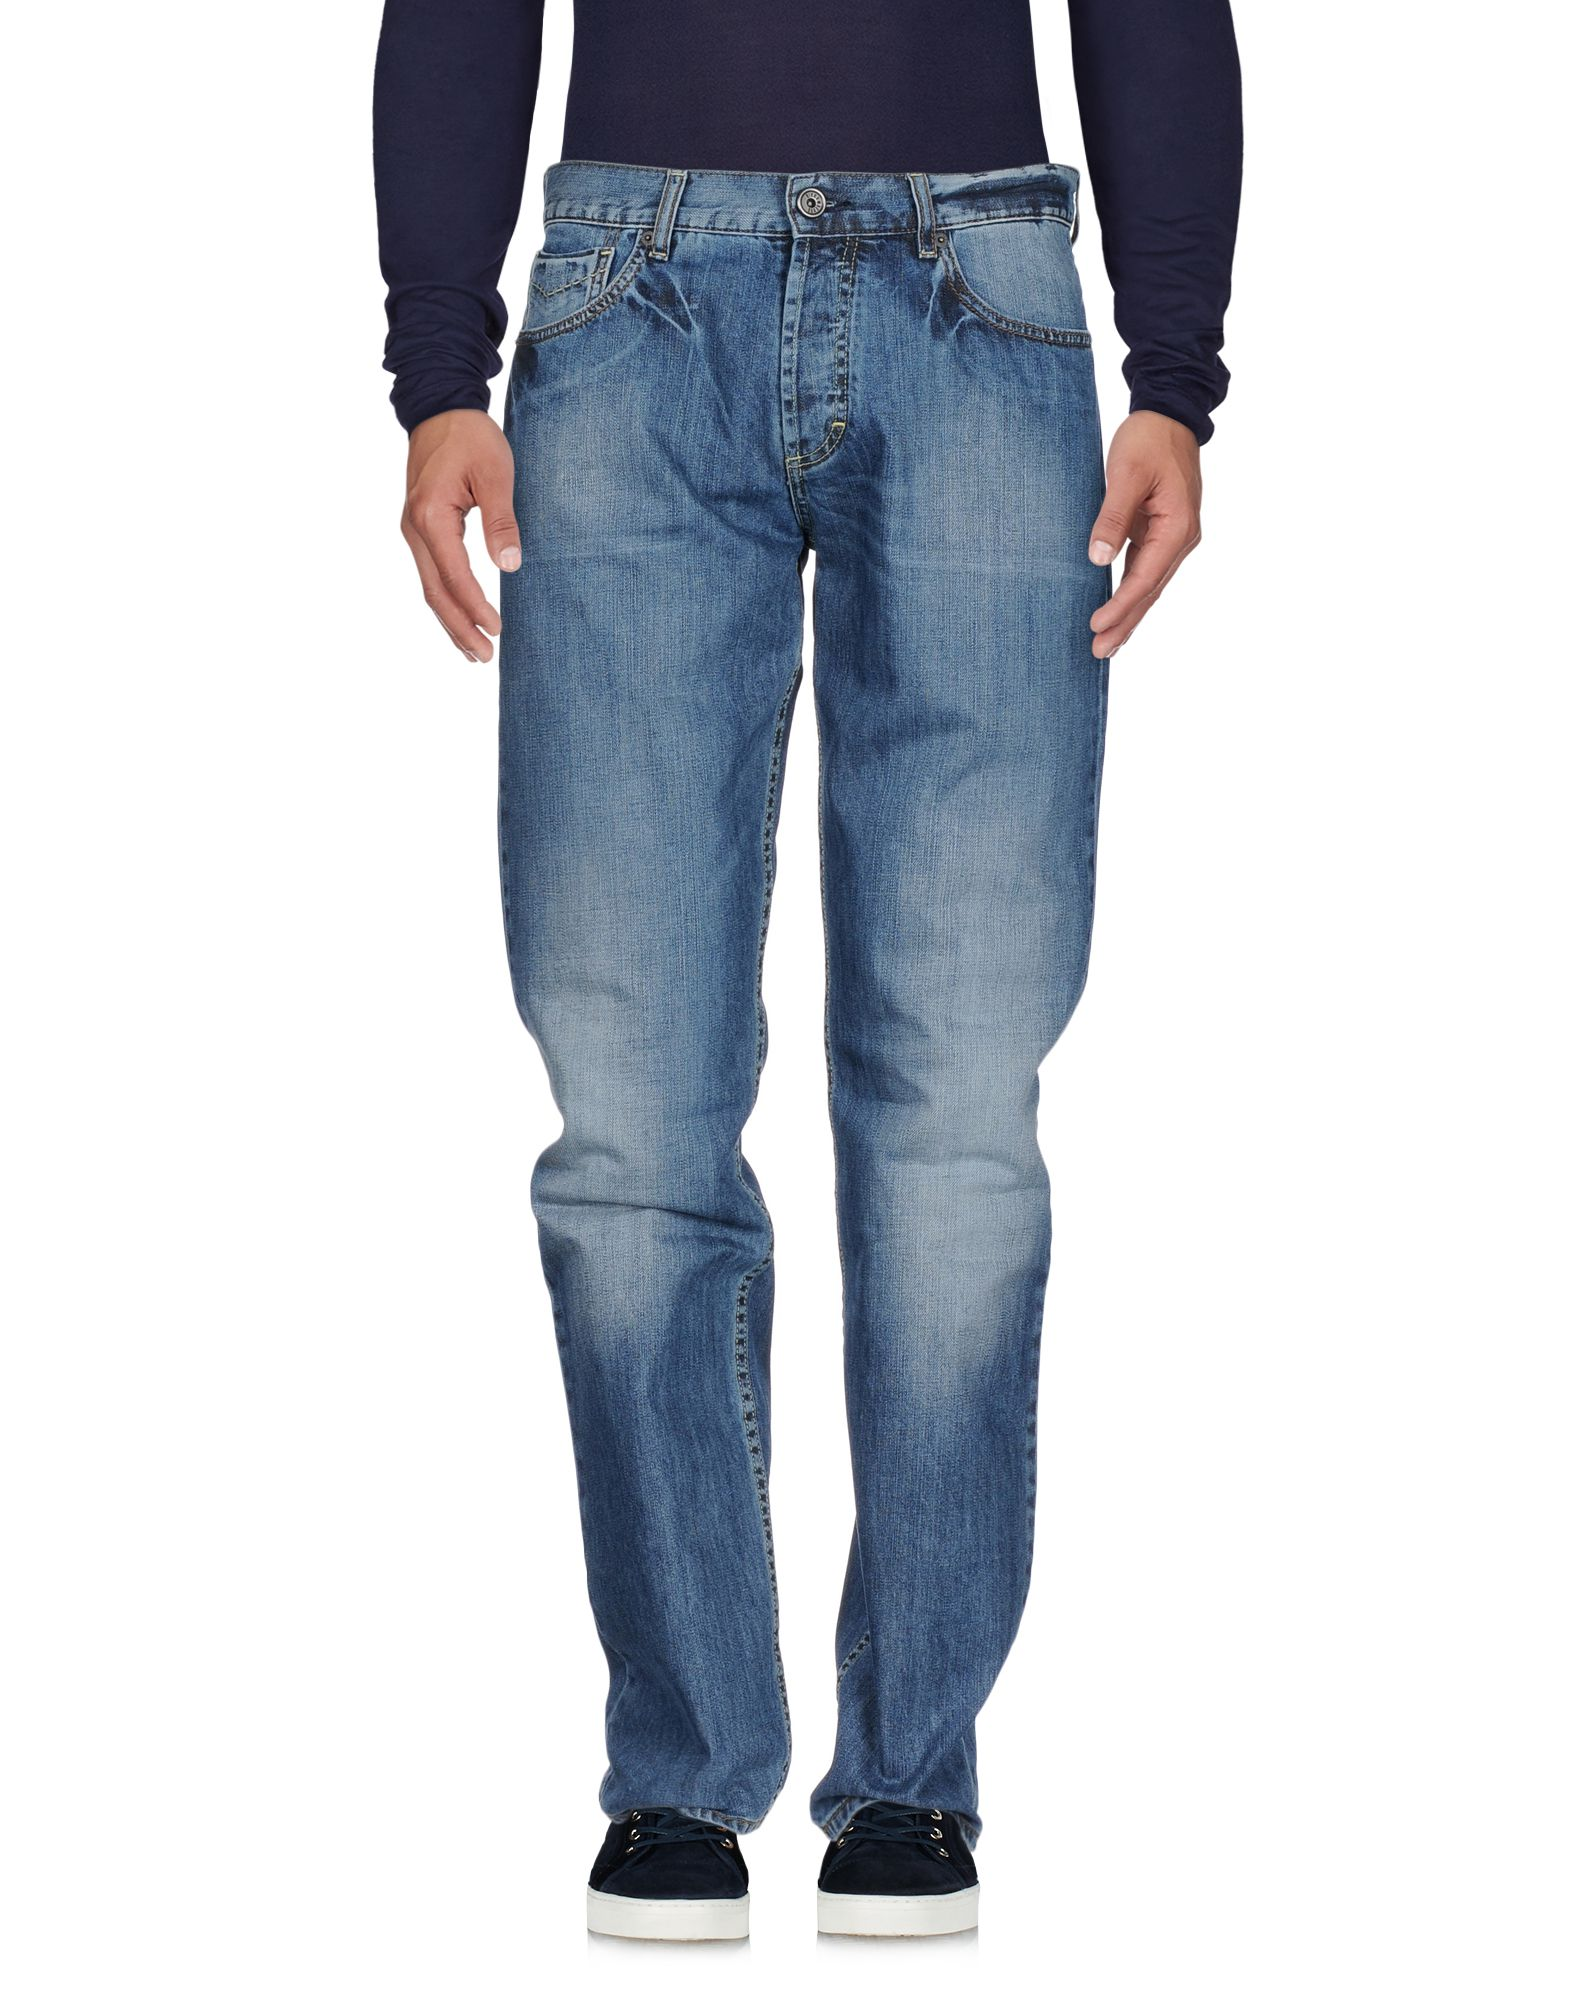 Pantaloni Jeans - Bikkembergs Uomo - Jeans 42674752OT 534bb7